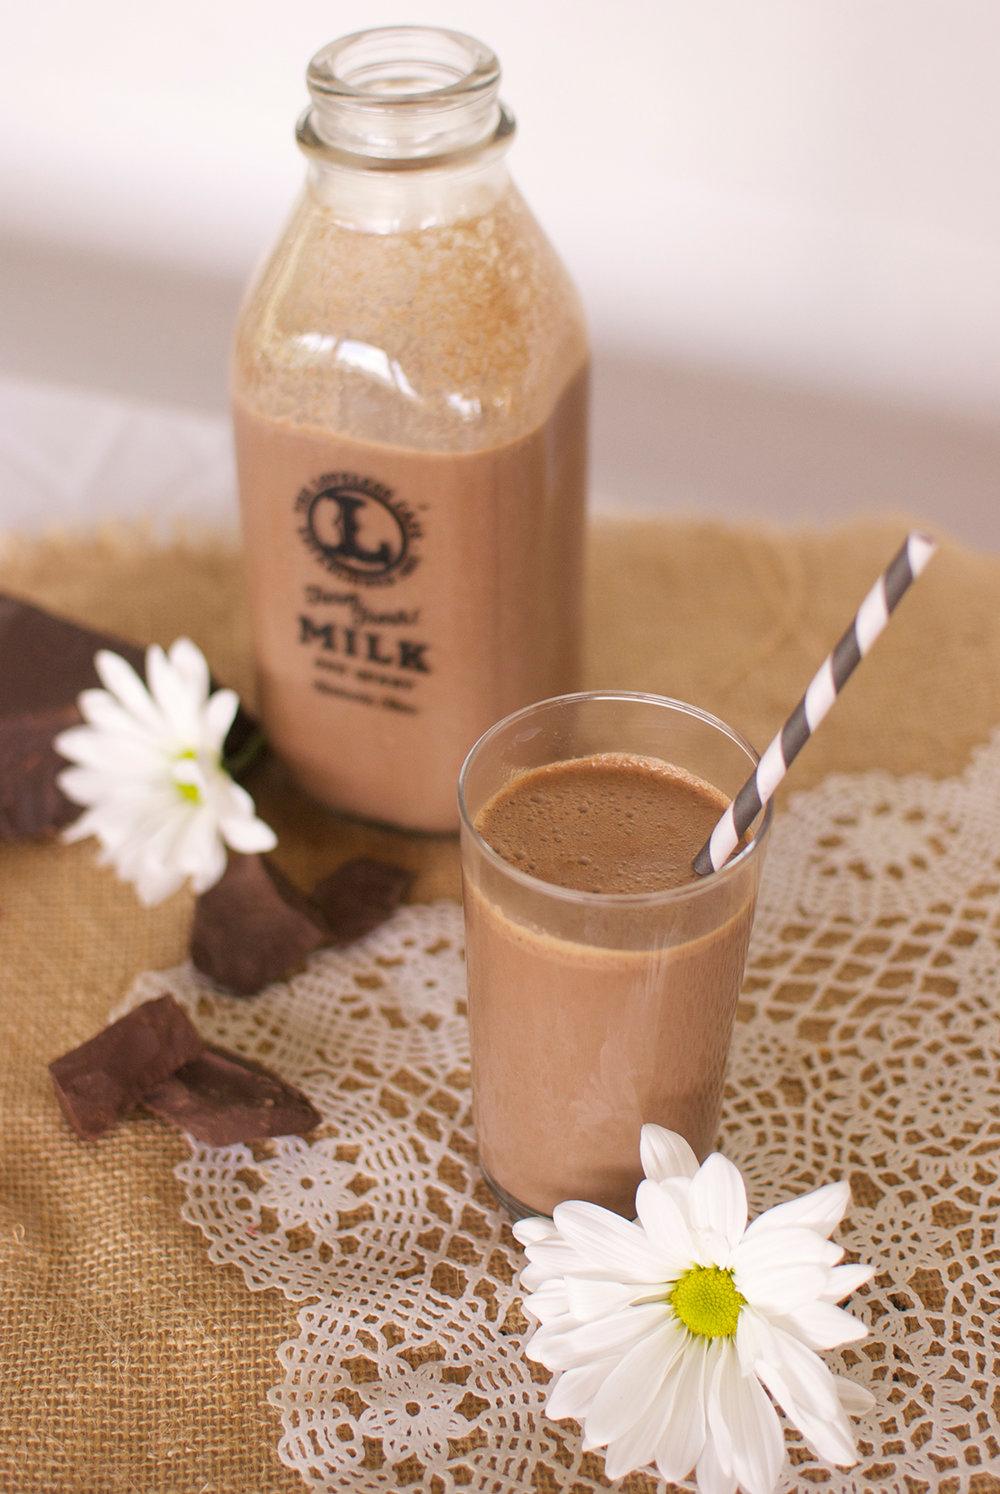 dark_chocolate_milk.jpg